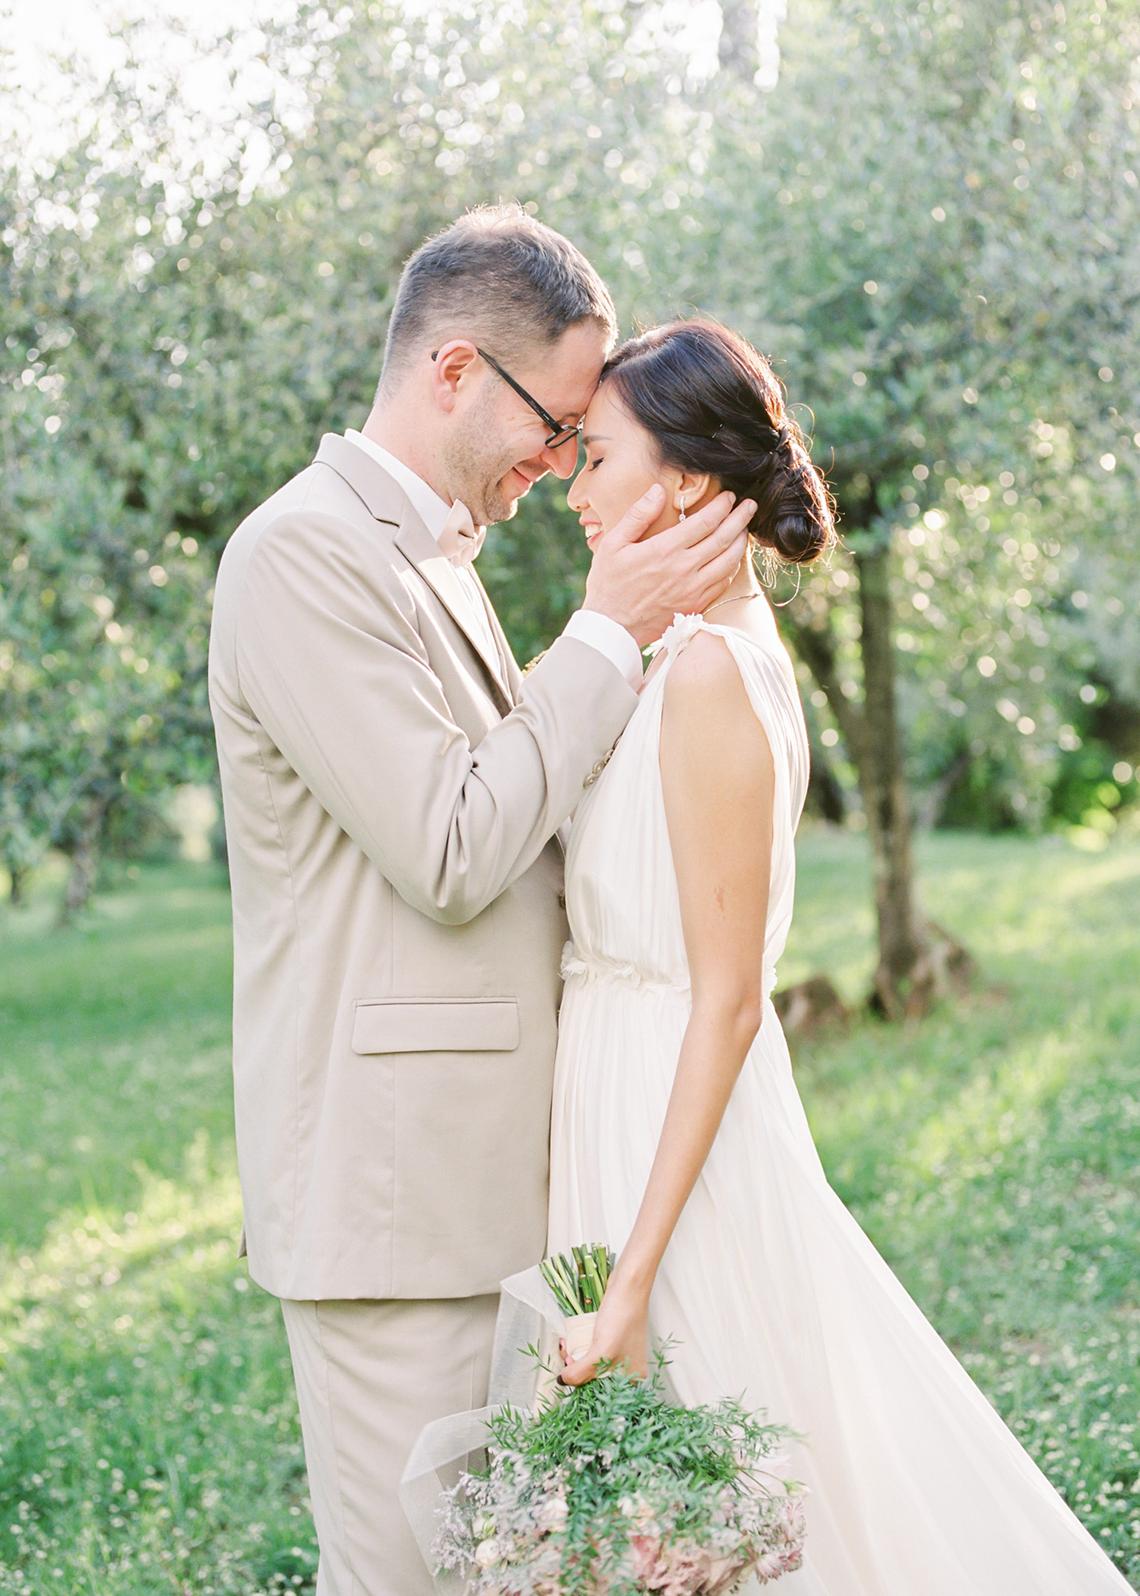 Romantic Florence Destination Wedding at Villa le Fontanelle – Olga Makarova 93